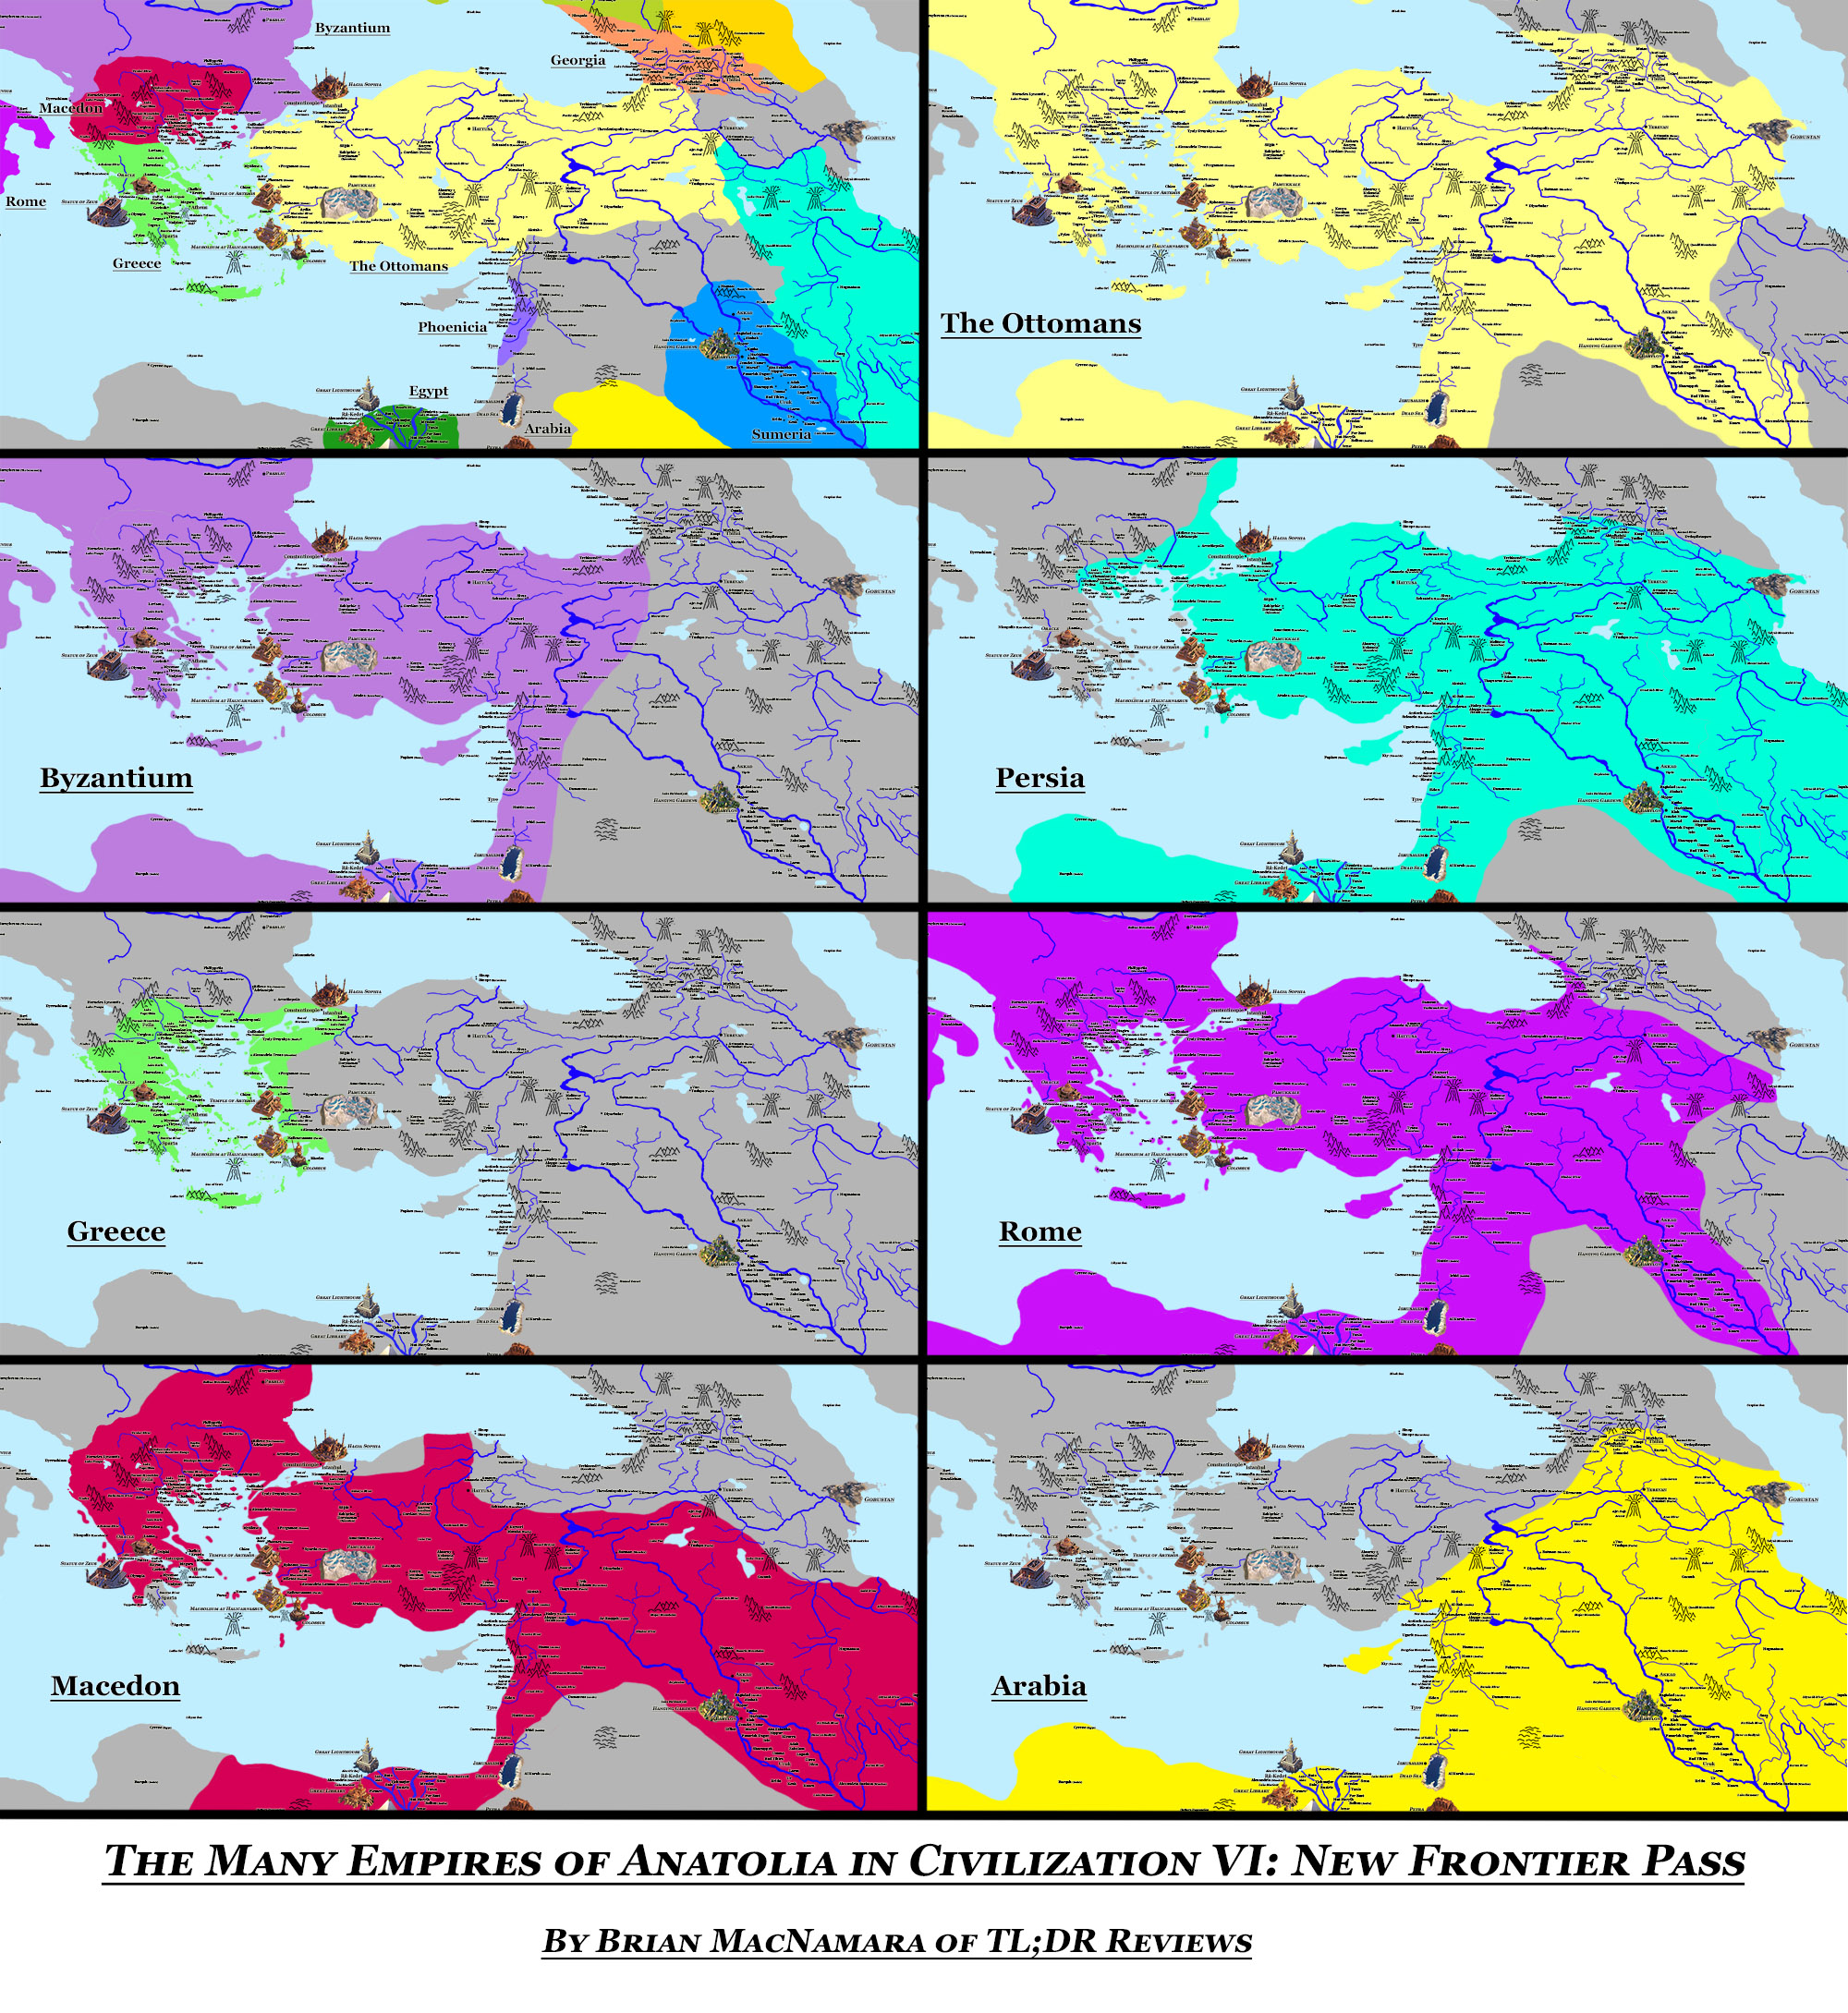 Civilization VI: New Frontiers Map - Anatolia. Image Credit: Brian MacNamara.